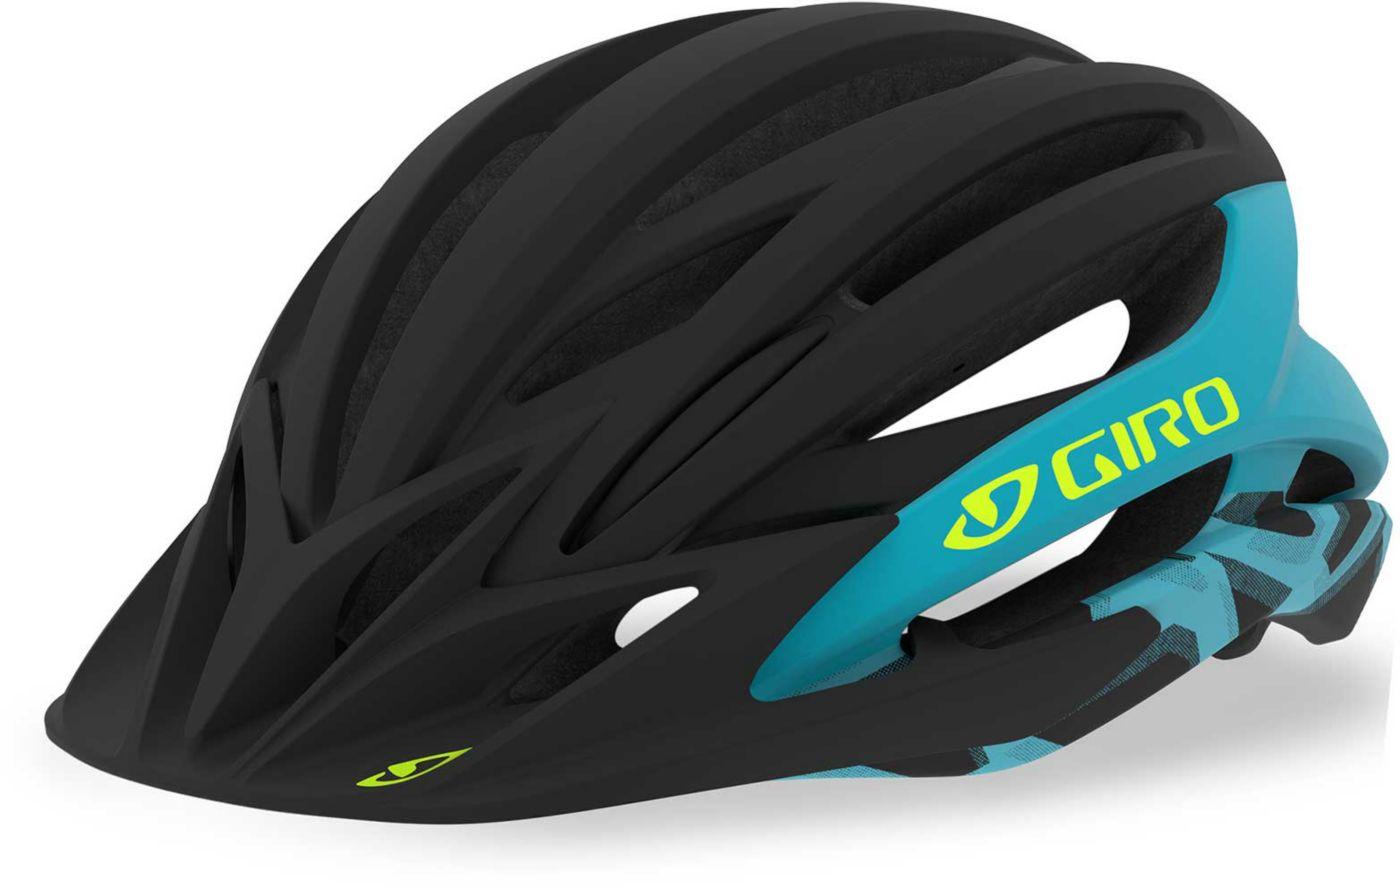 Giro Adult Artex MIPS Bike Helmet